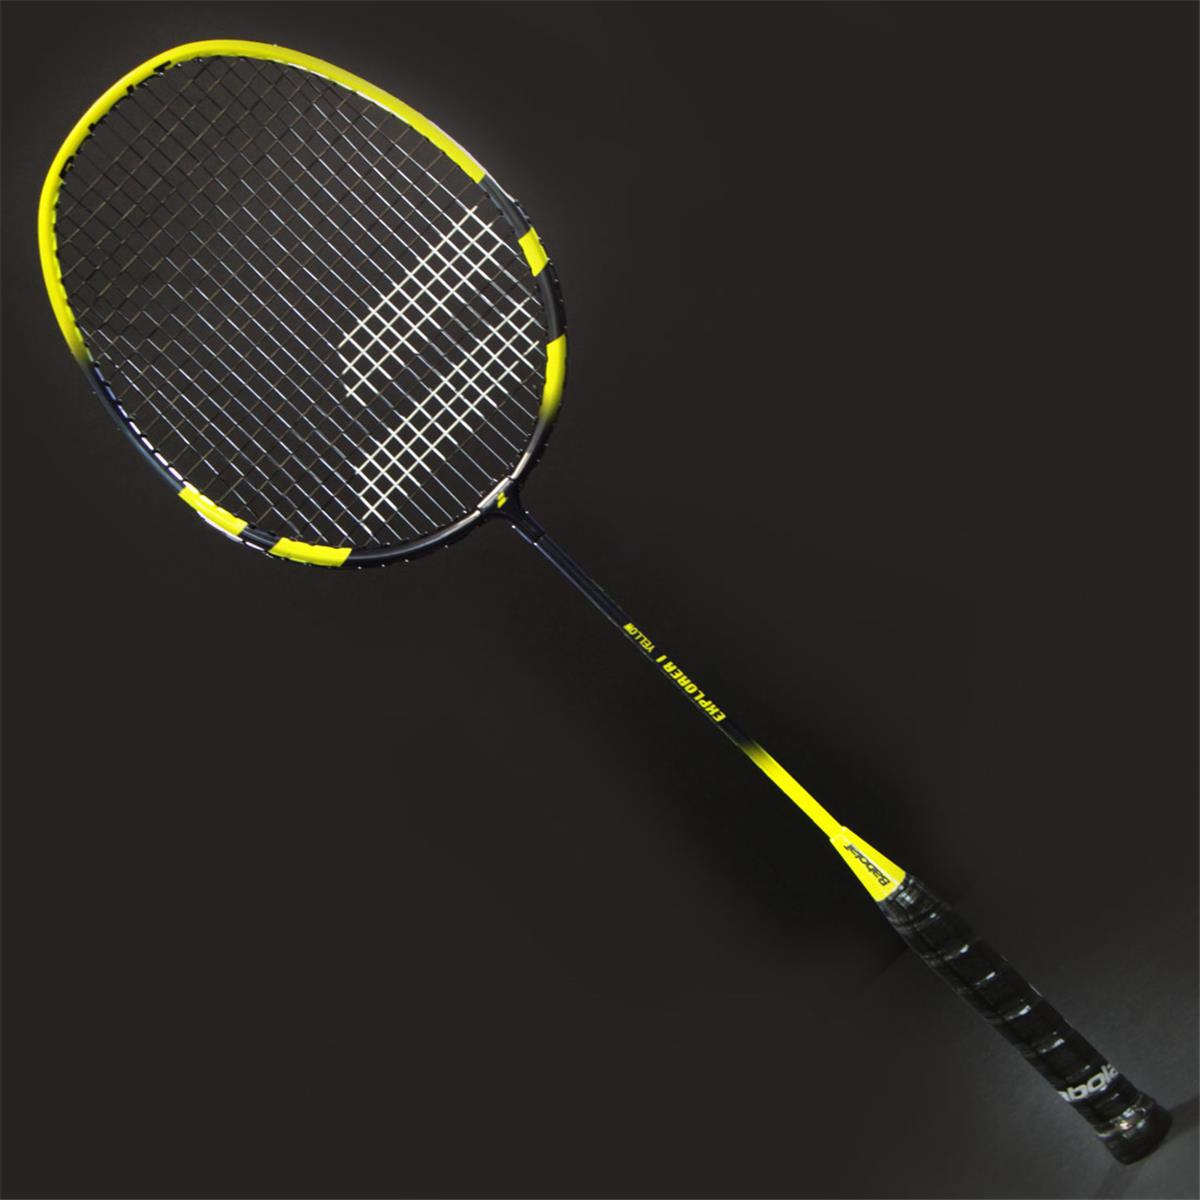 Babolat Base Explorer I Badminton Racket | Direct Badminton